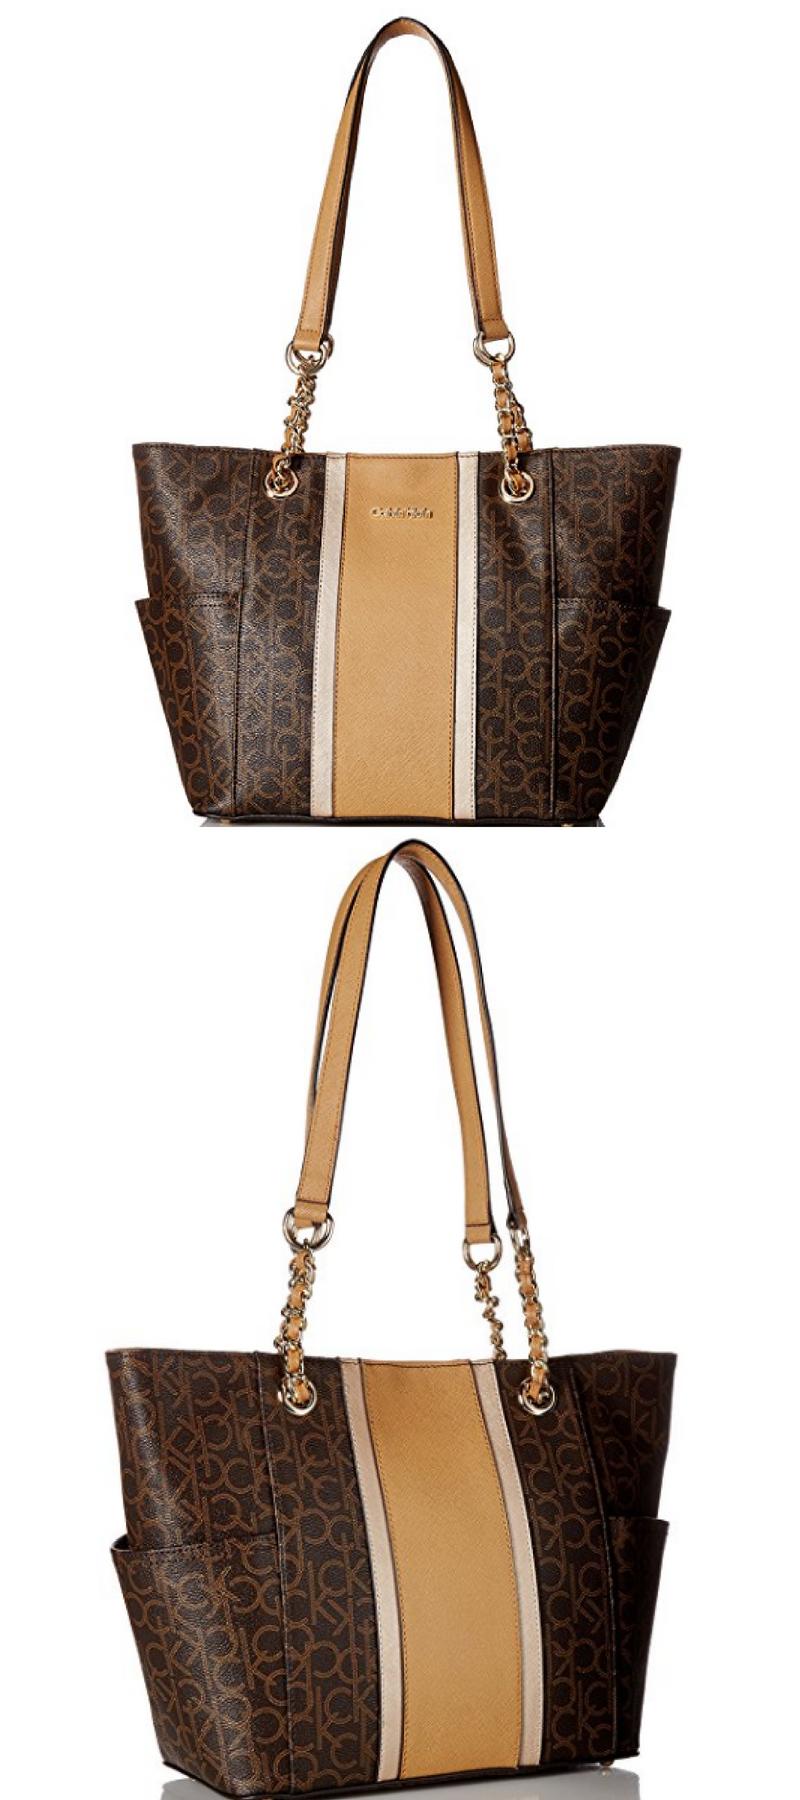 Calvin Klein 1 HU Logo Tote Shoulder Bag Woman s fashion bags, Woman s  designed bags, fashion, design, Women s Designed Handbag 87763cbe11